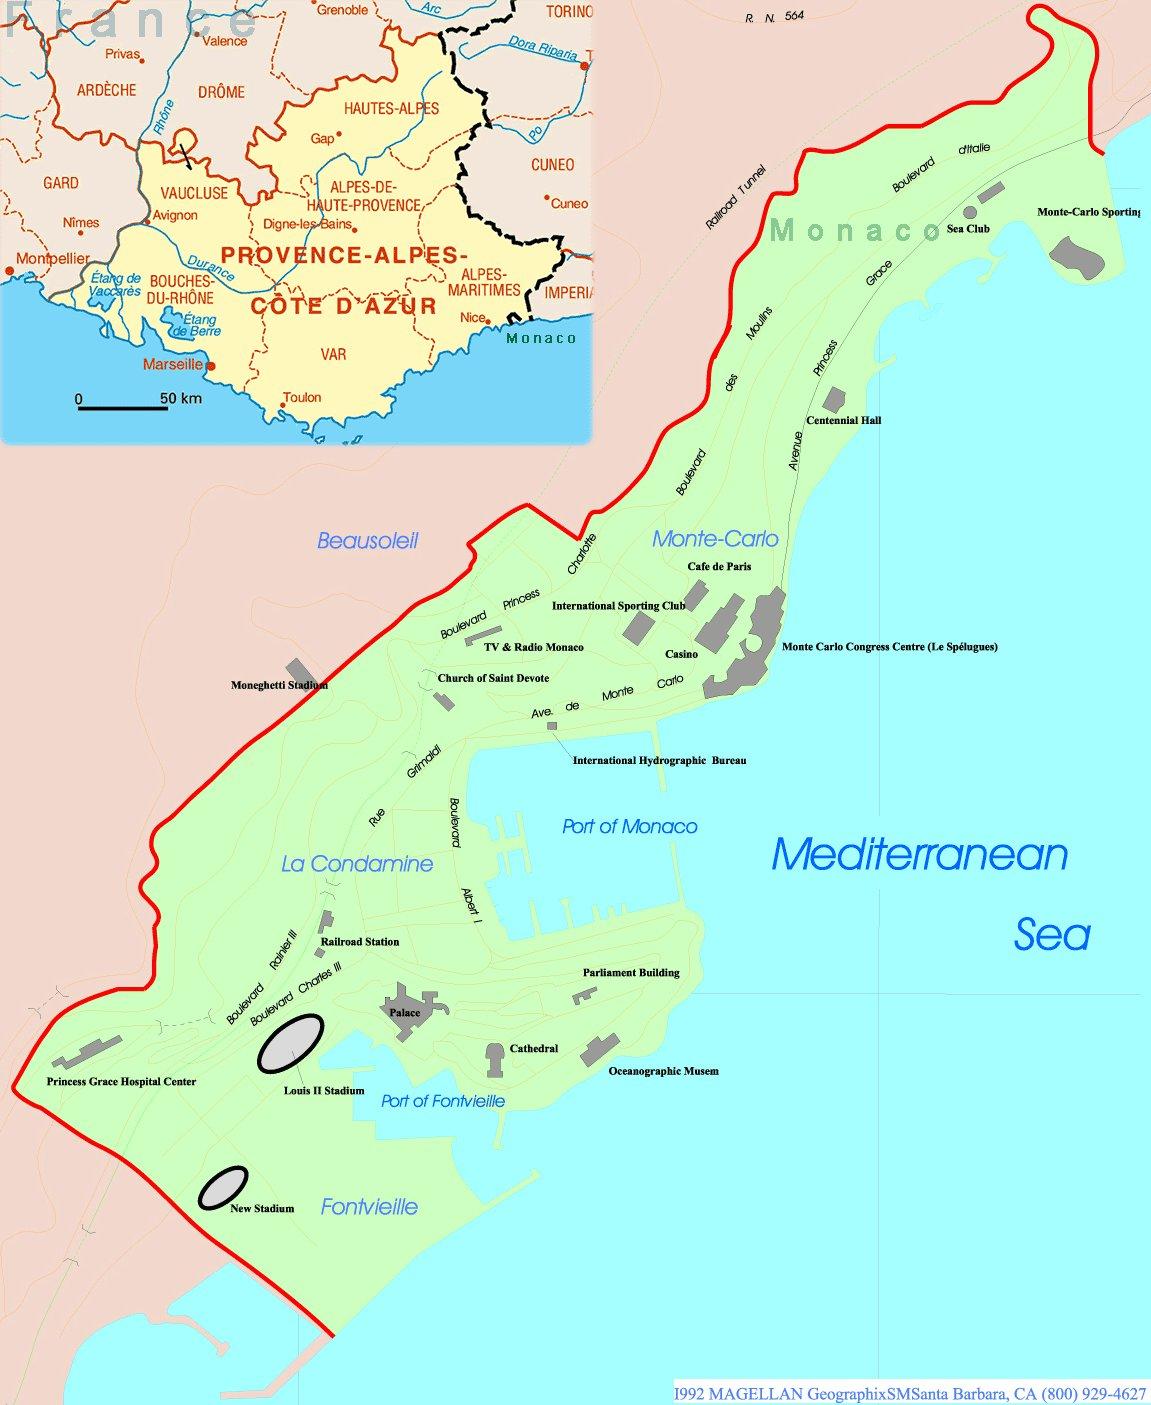 Karty Monako Podrobnaya Karta Monako Na Russkom Yazyke S Kurortami